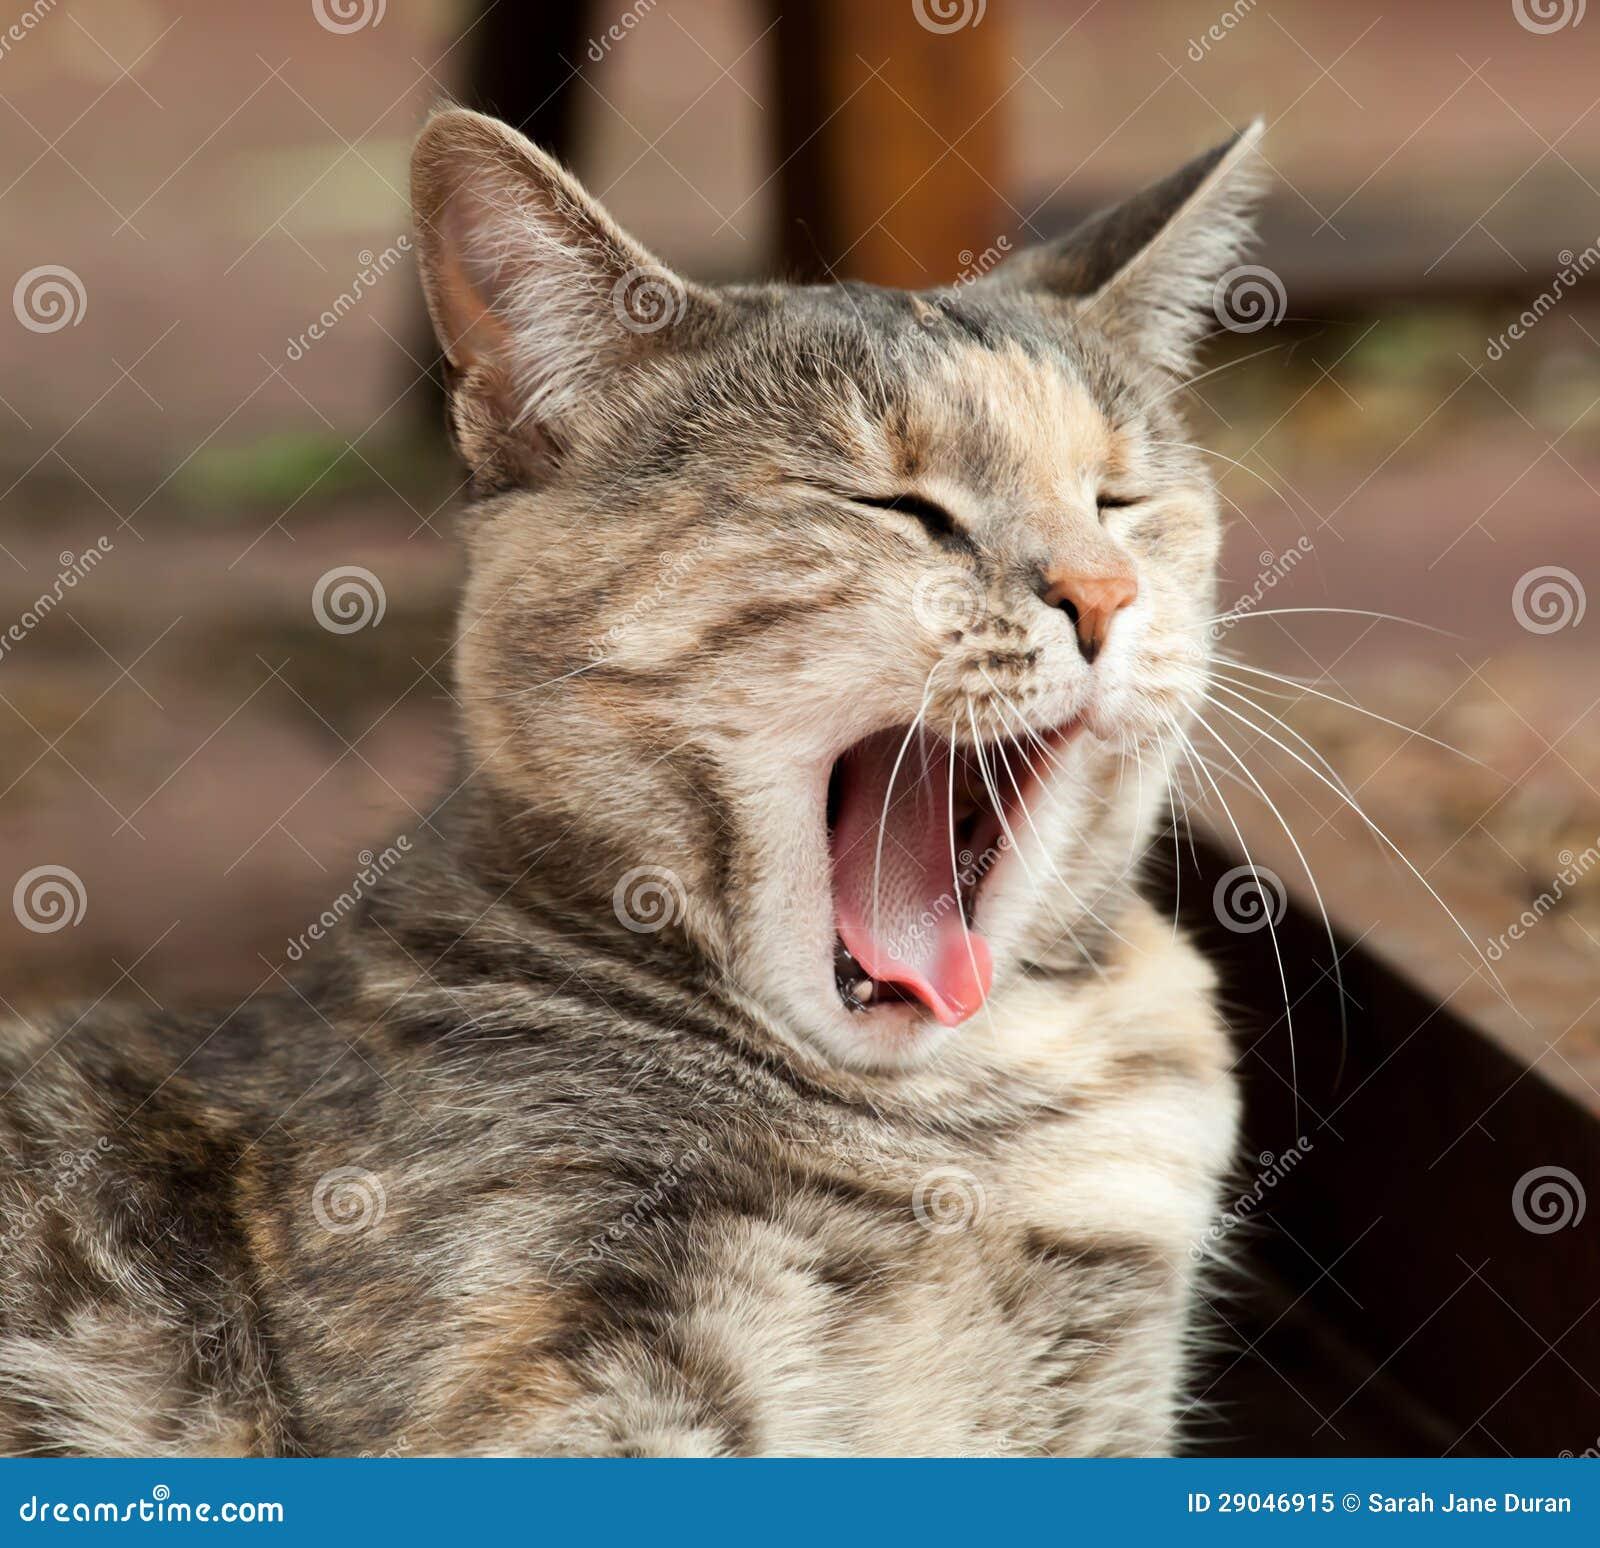 Rare Tortoiseshell-Tabby (Torbie) cat yawning and sleepy outside. Torbie Cat